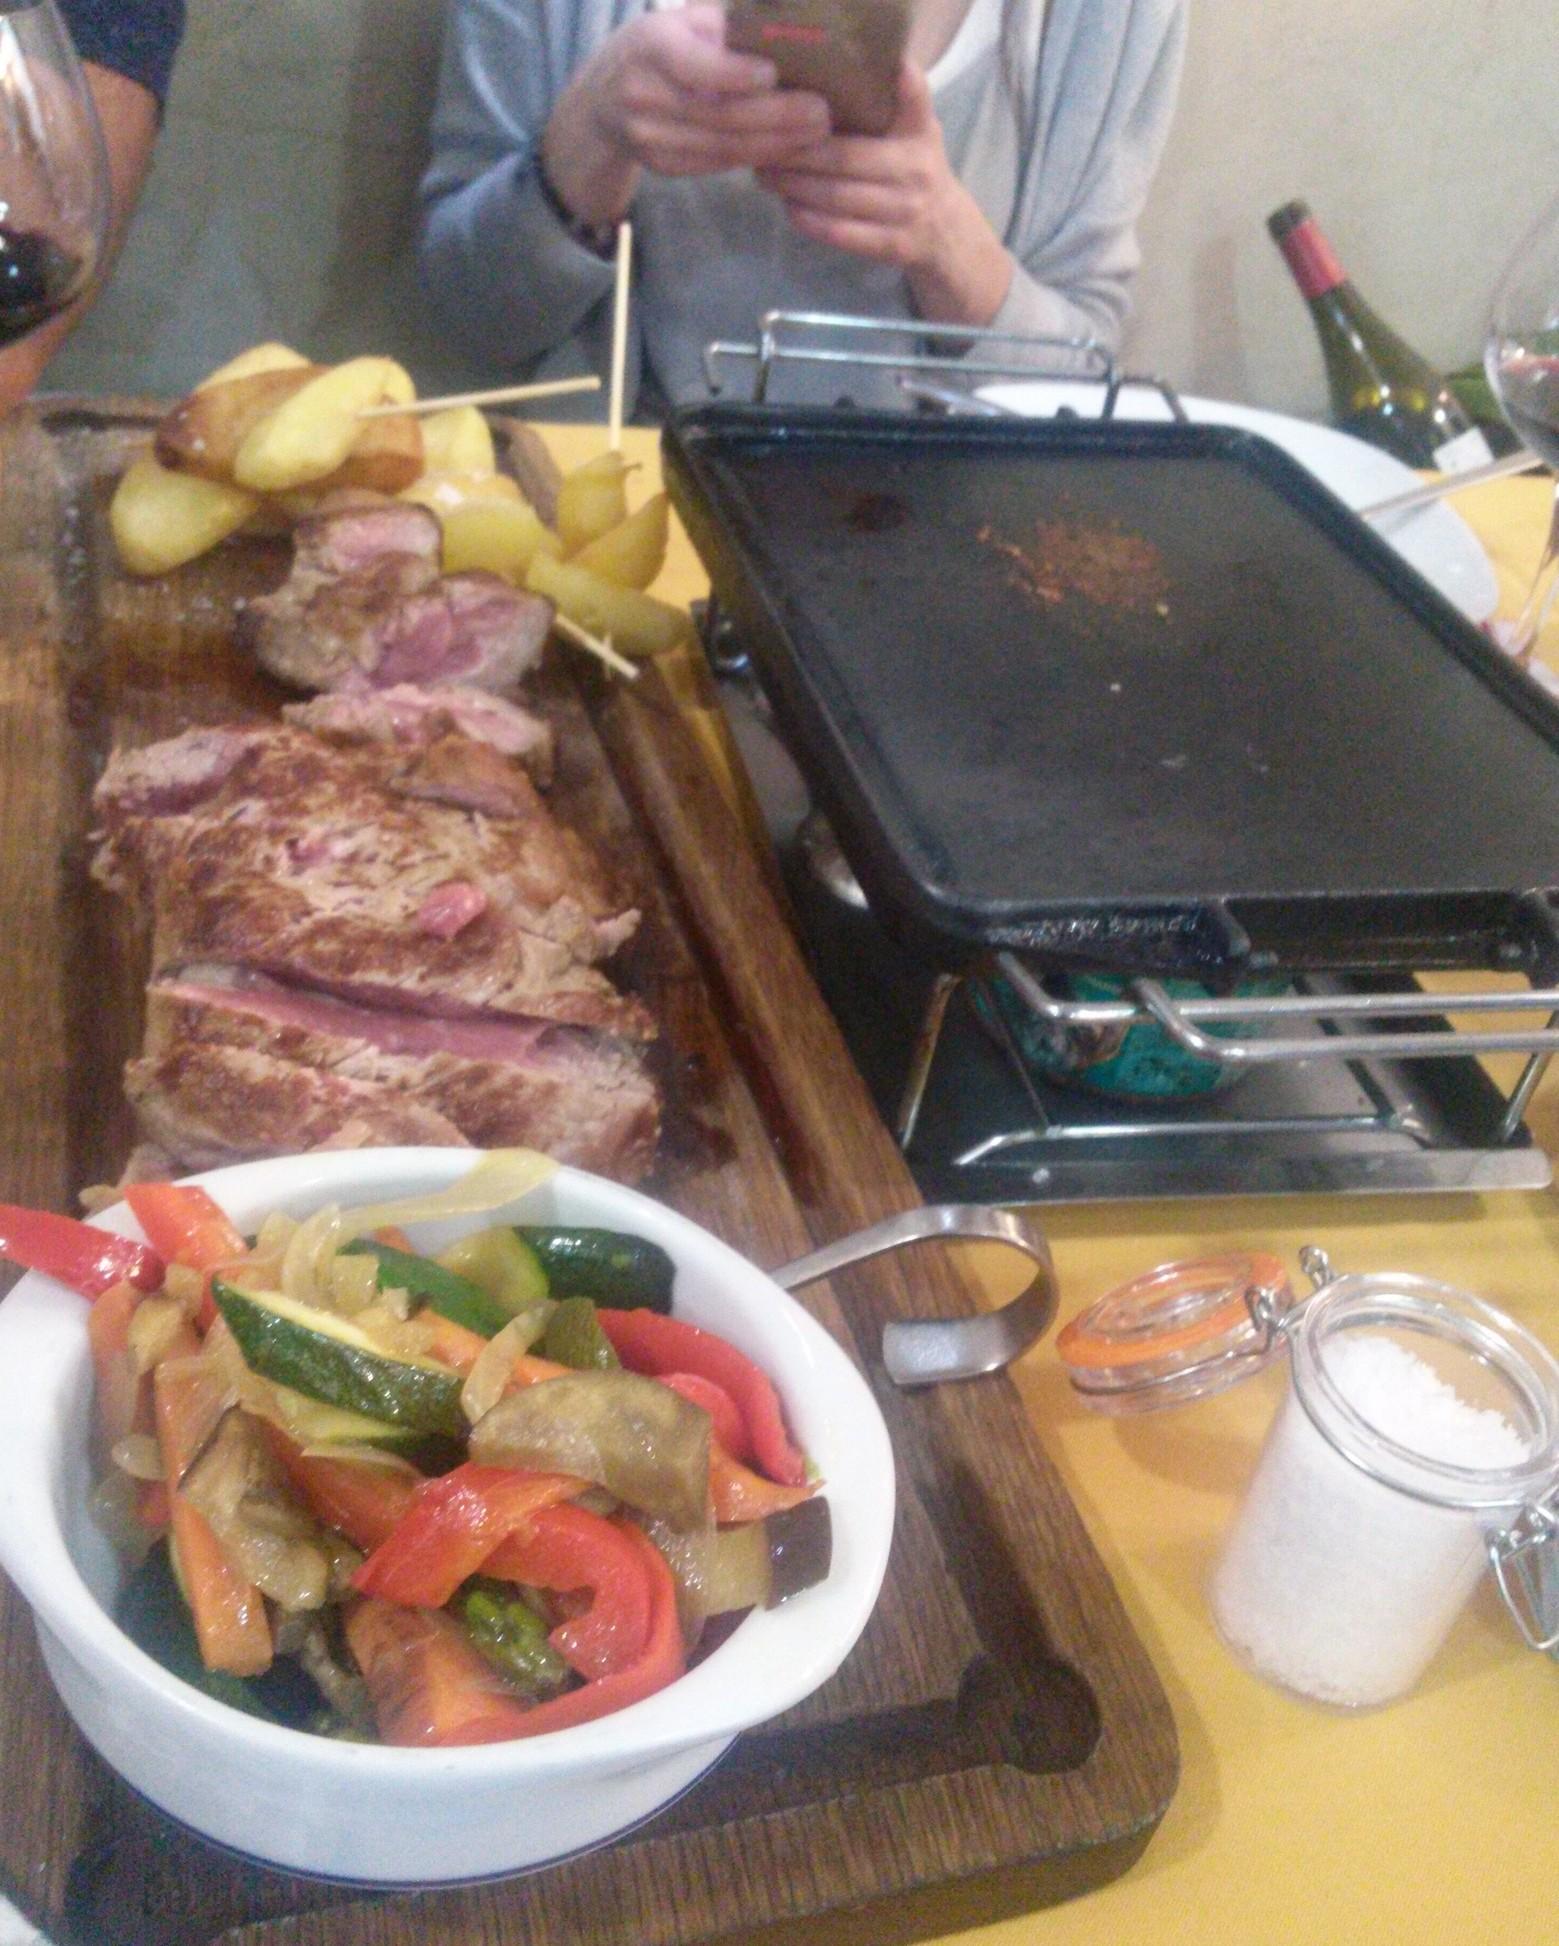 Excelente carne gallega a la piedra en O' Peregrino Bizarro, comida 25 febrero, postcata Jerez